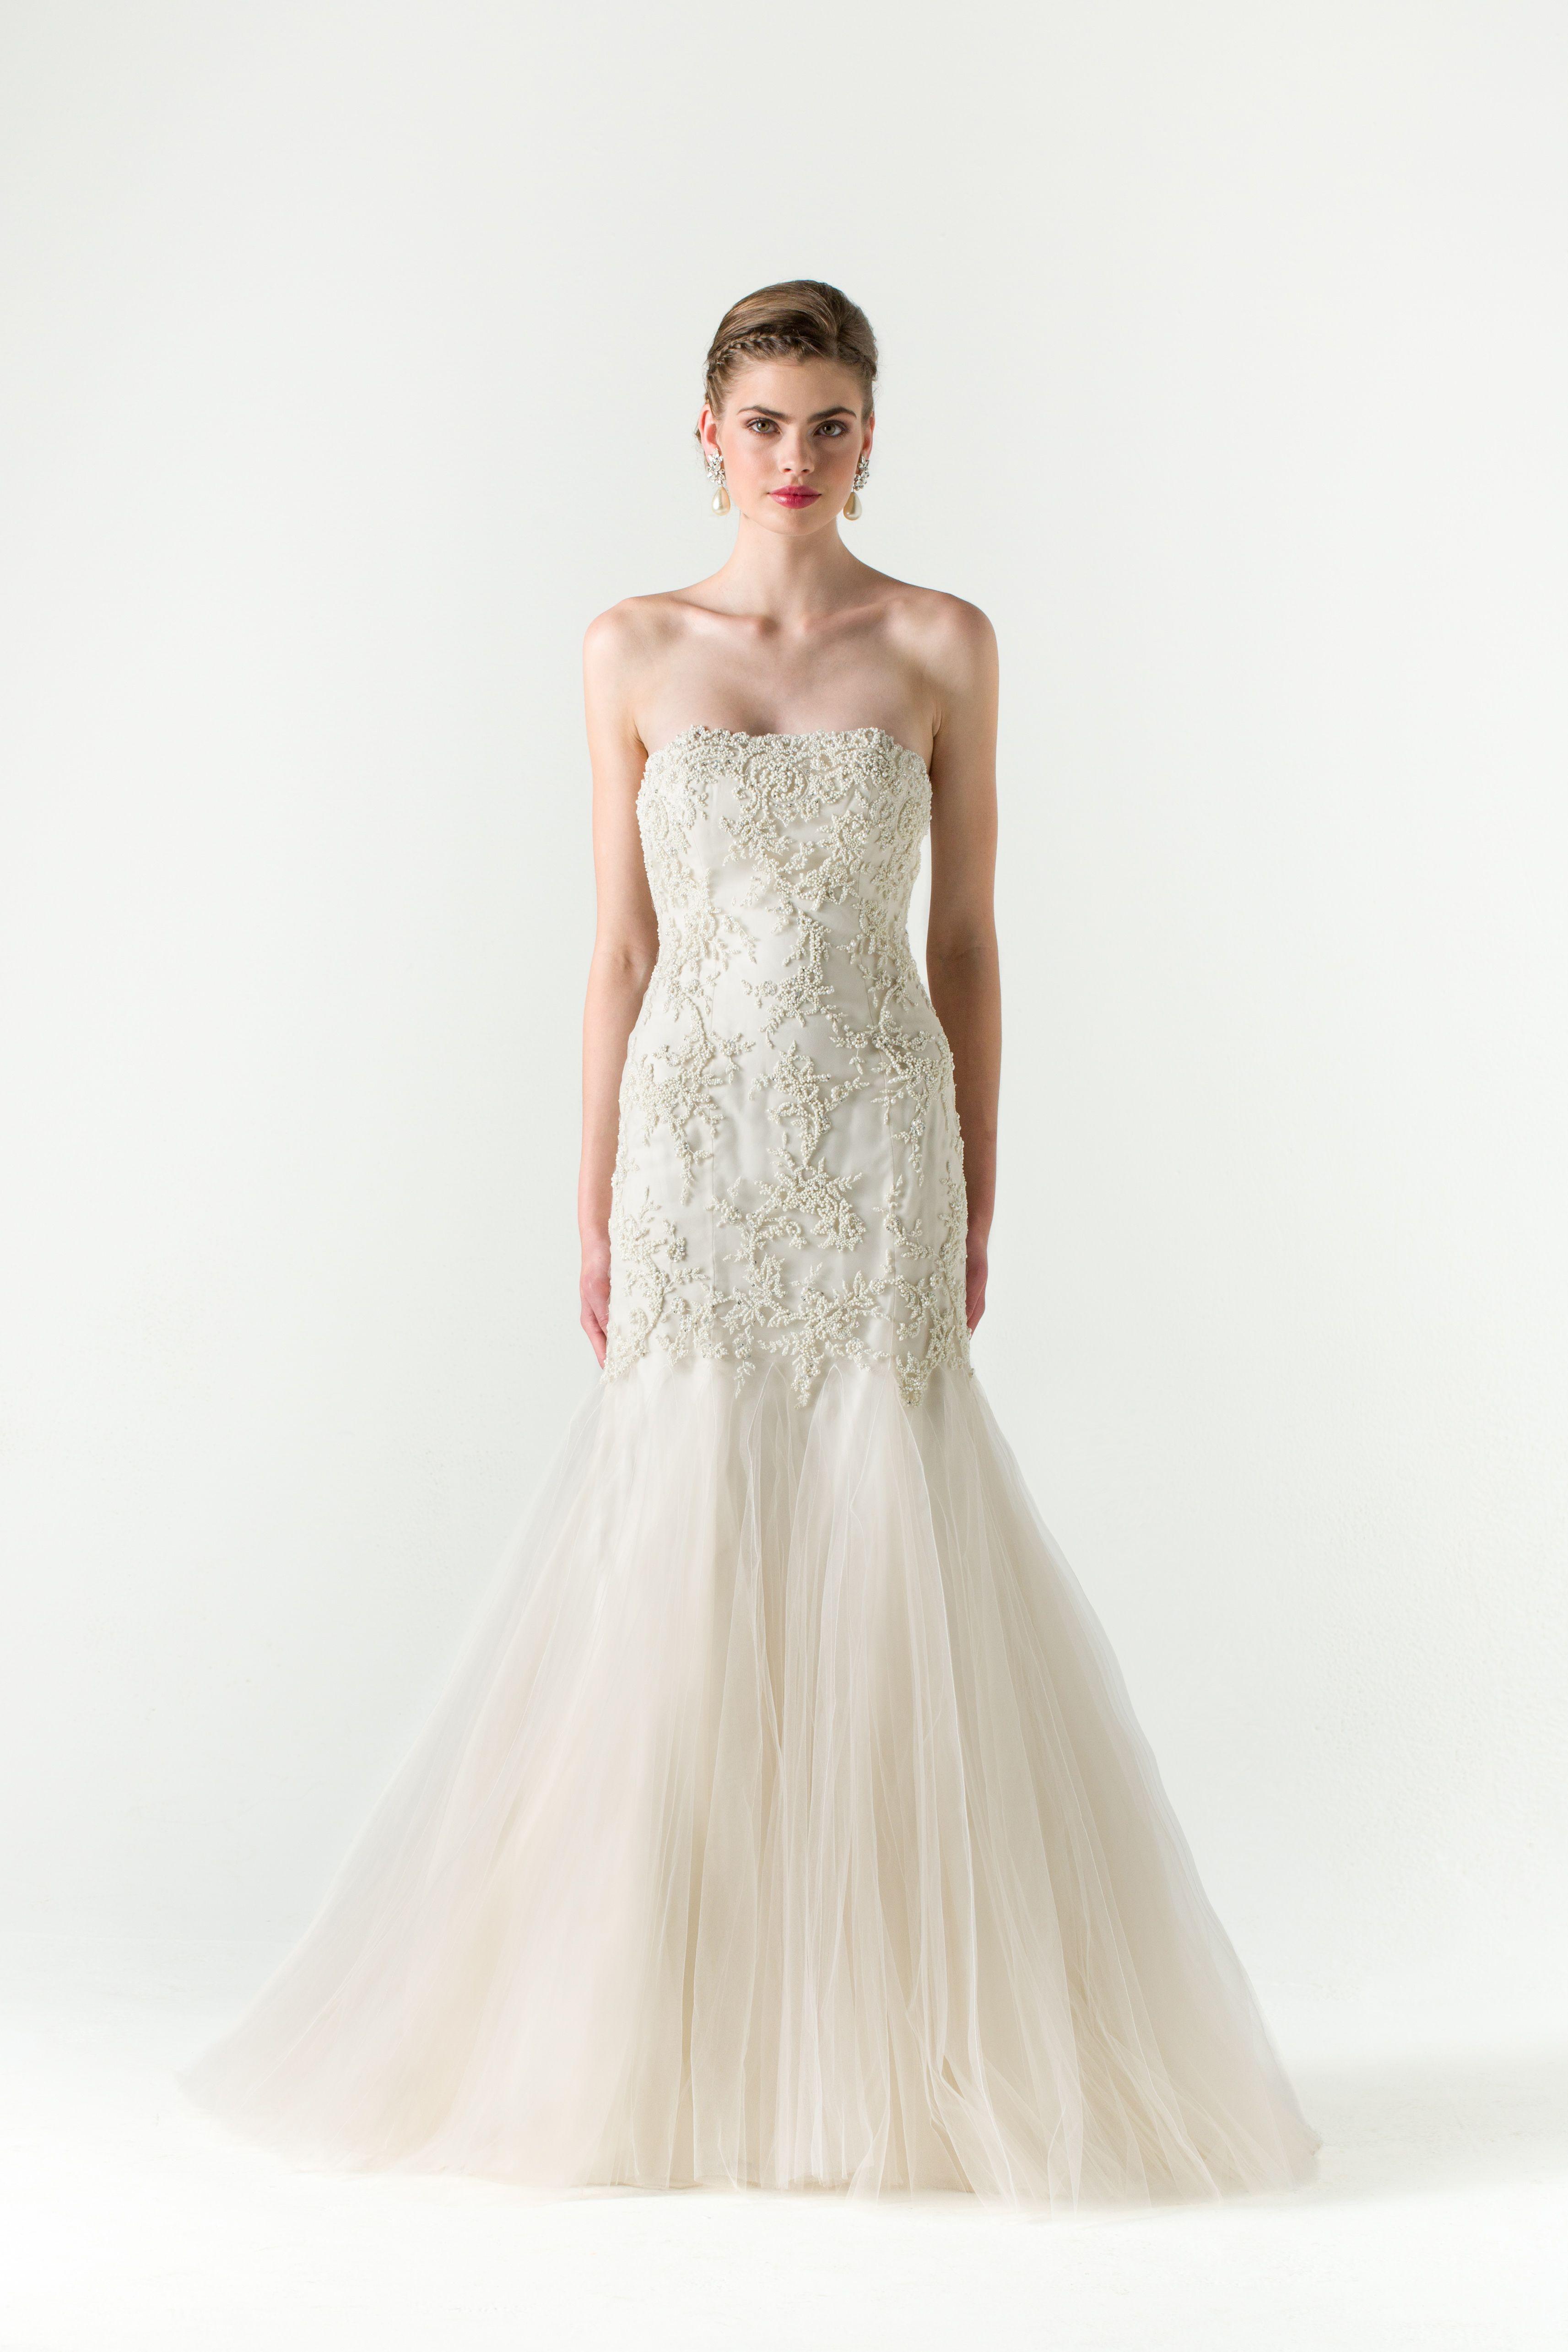 Wedding Dresses Westport Ct - Wedding Short Dresses